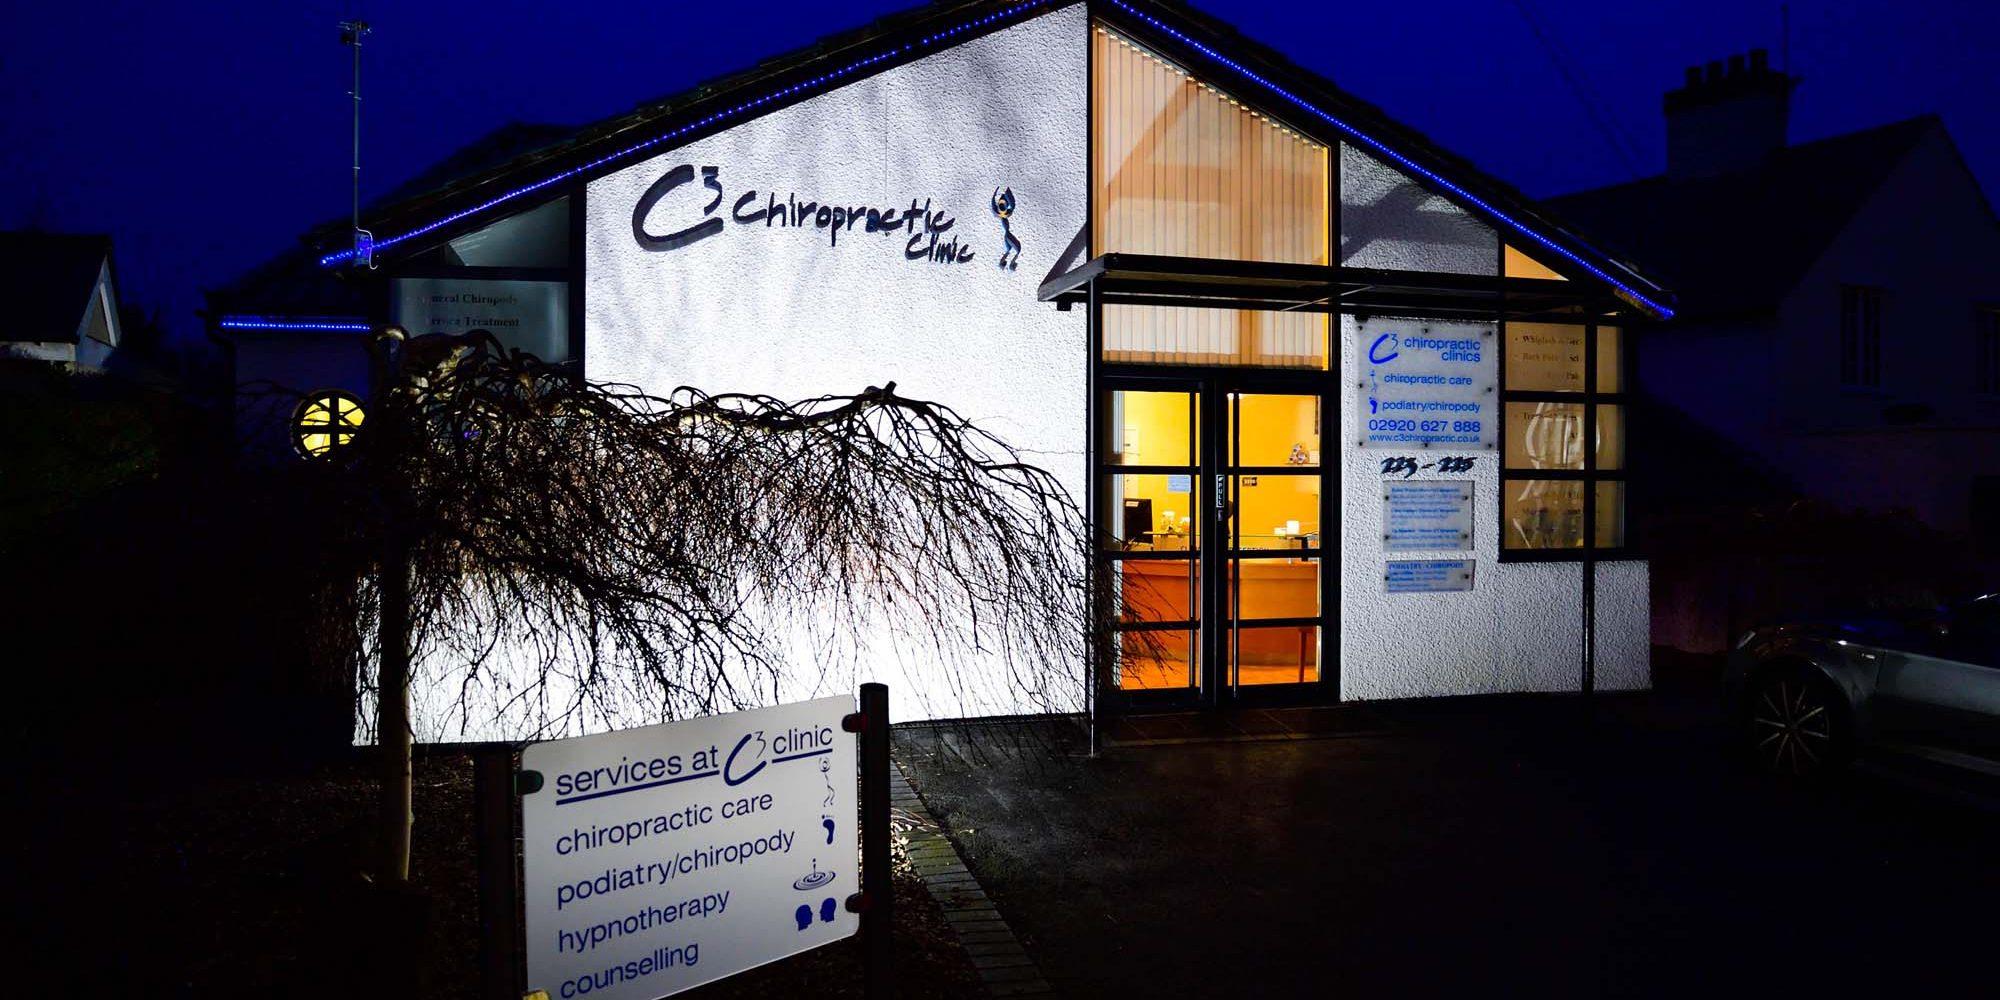 Cardiff Chiropractor